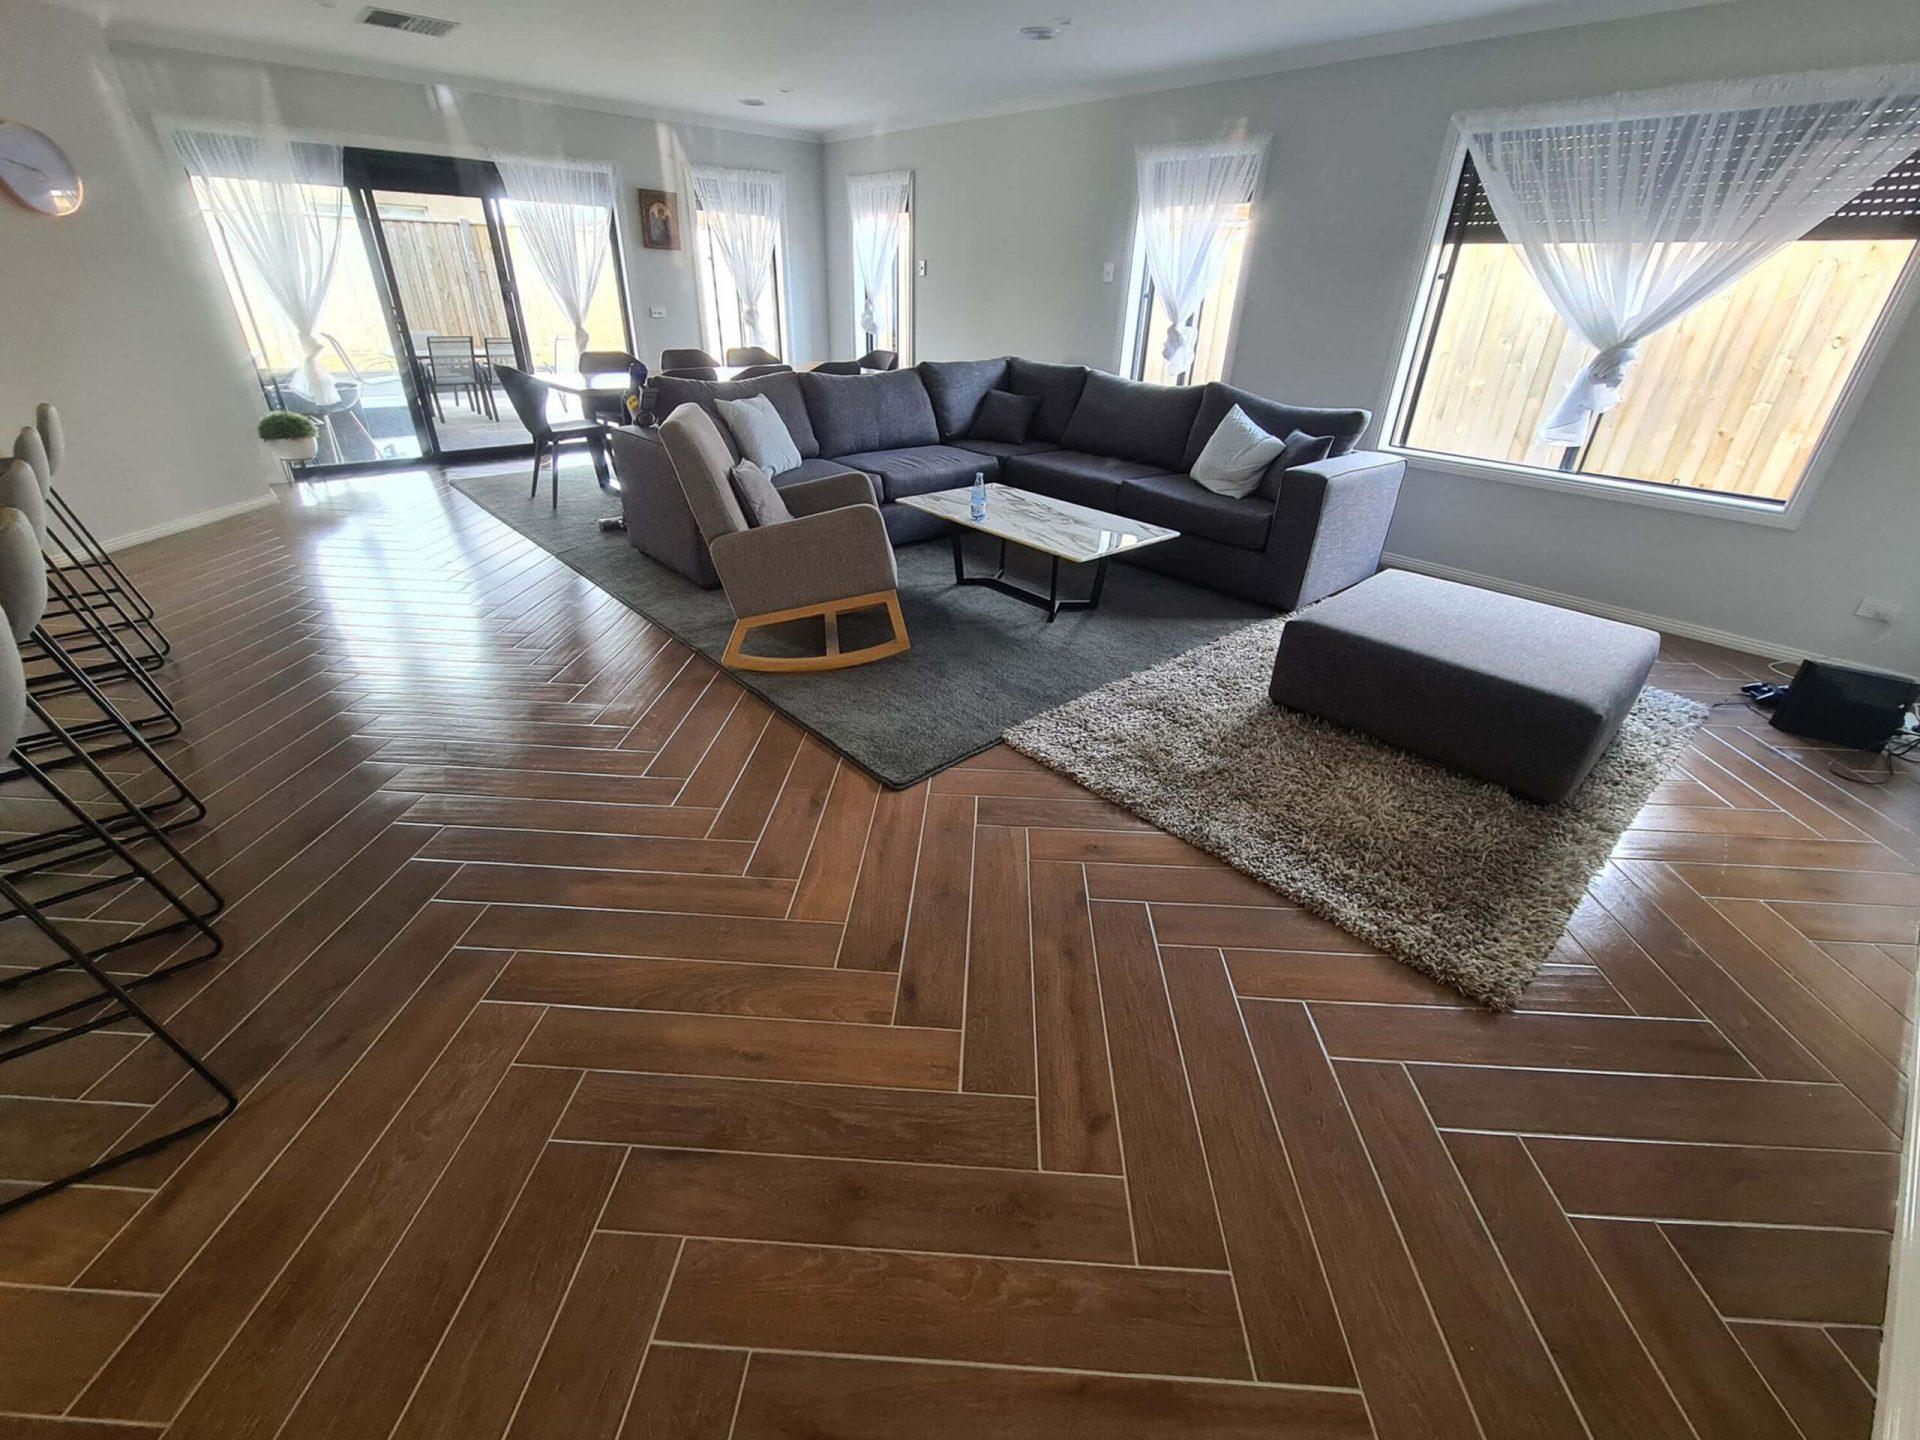 Lounge area tiled